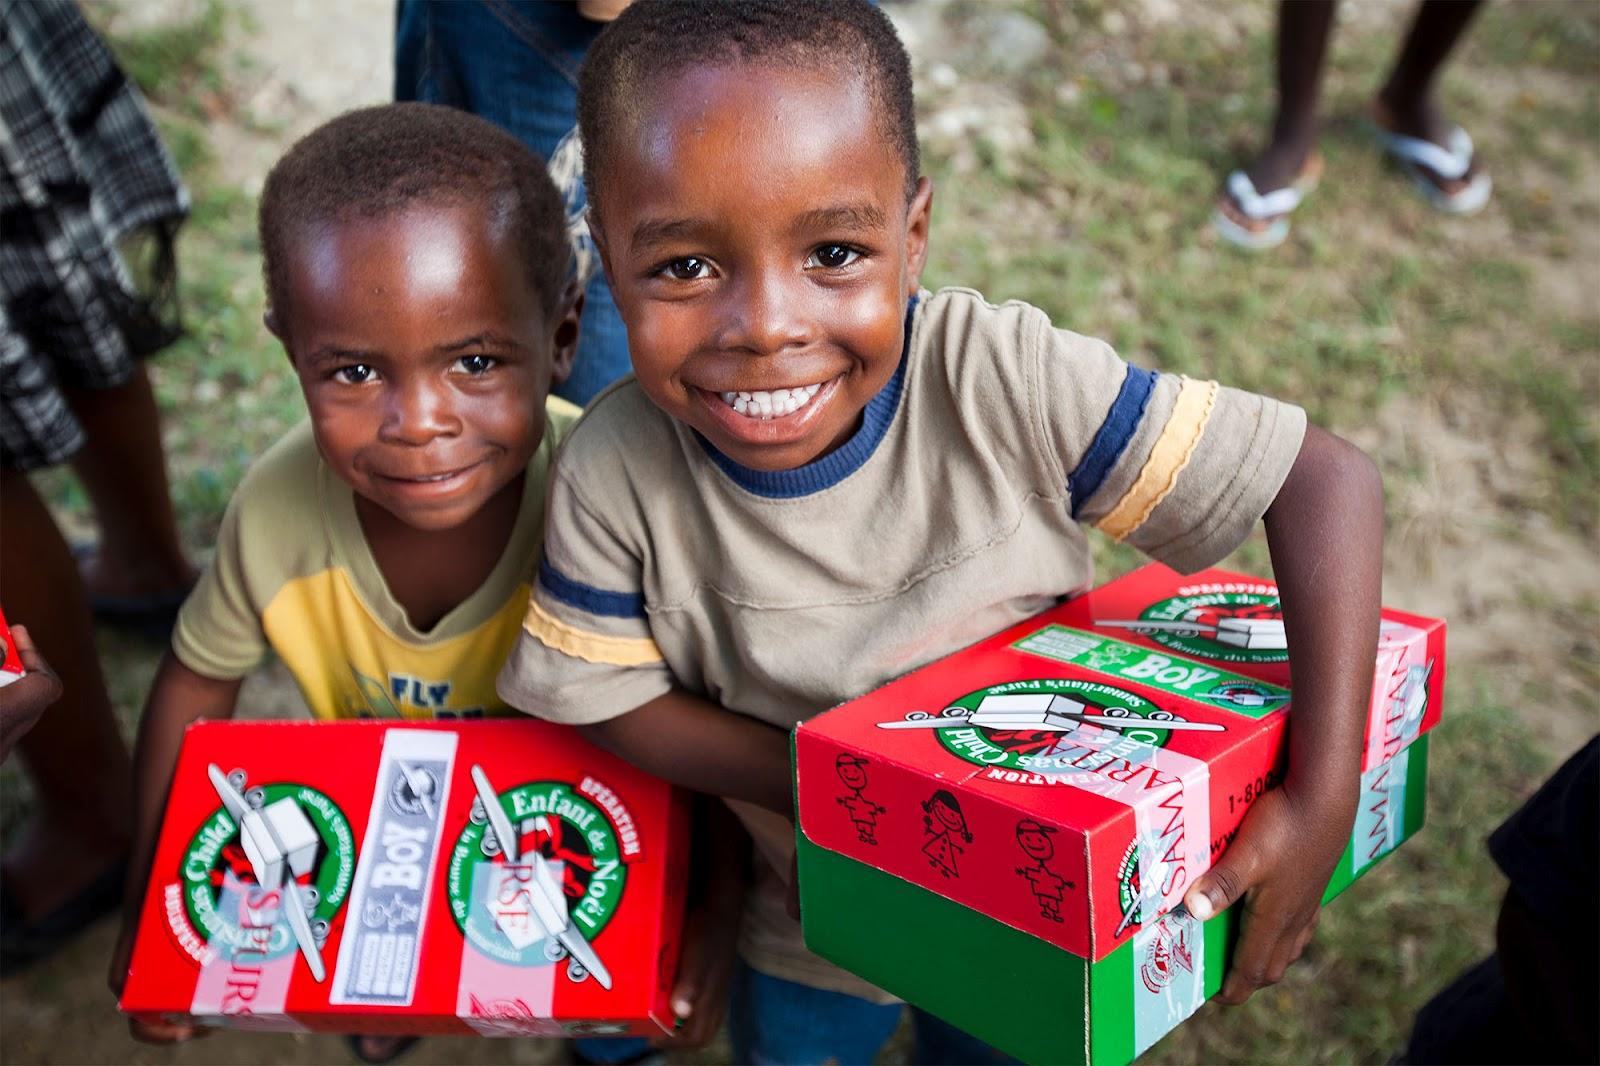 Christmas Shoebox Appeal.The Centenary Shoebox Appeal Sunday Centenary Salvos The